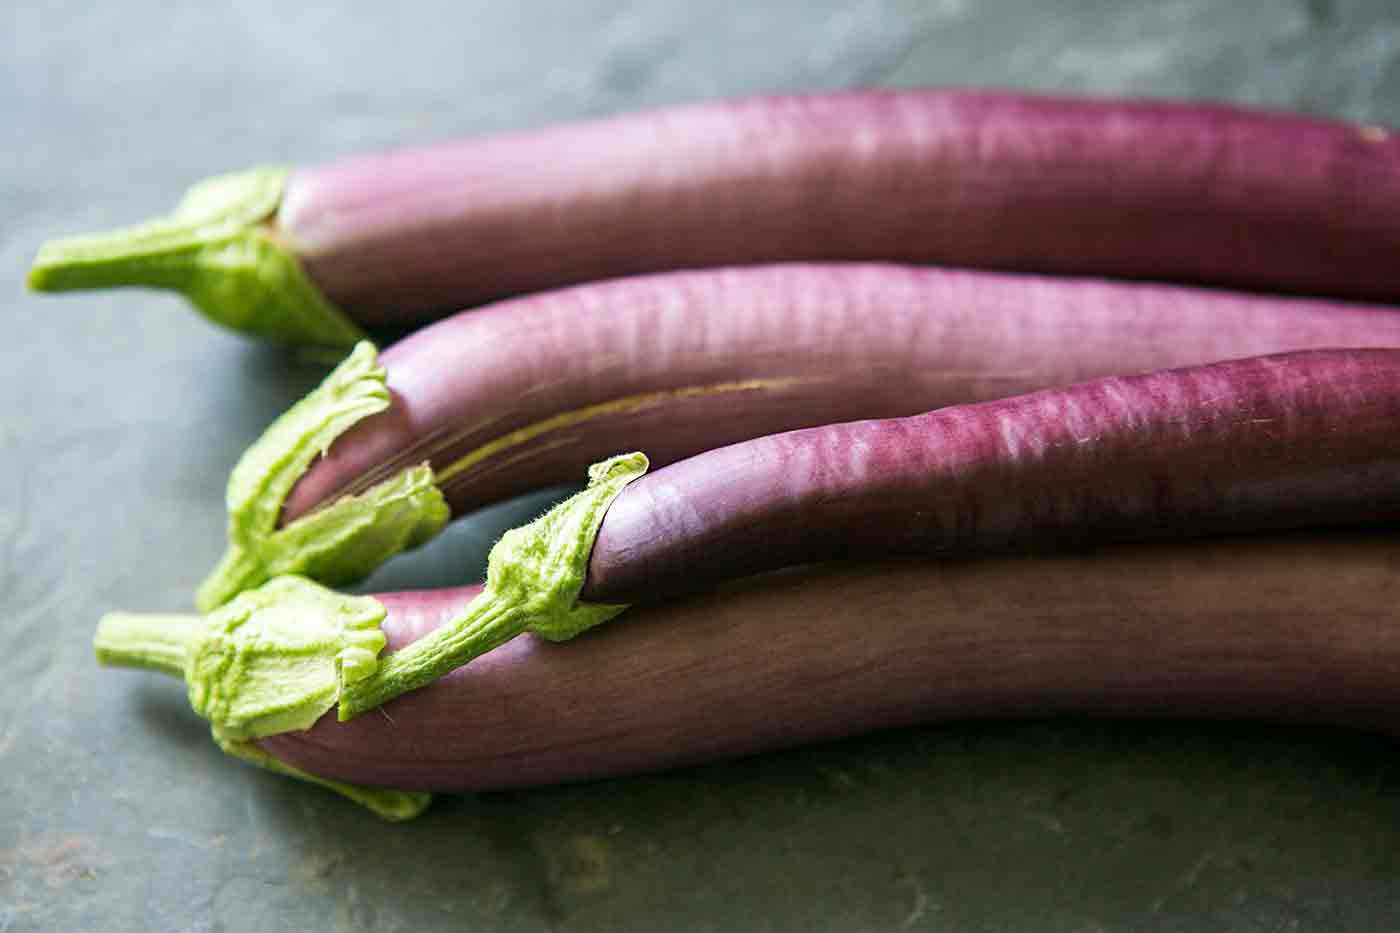 Japanese Eggplant for making eggplant stir fry